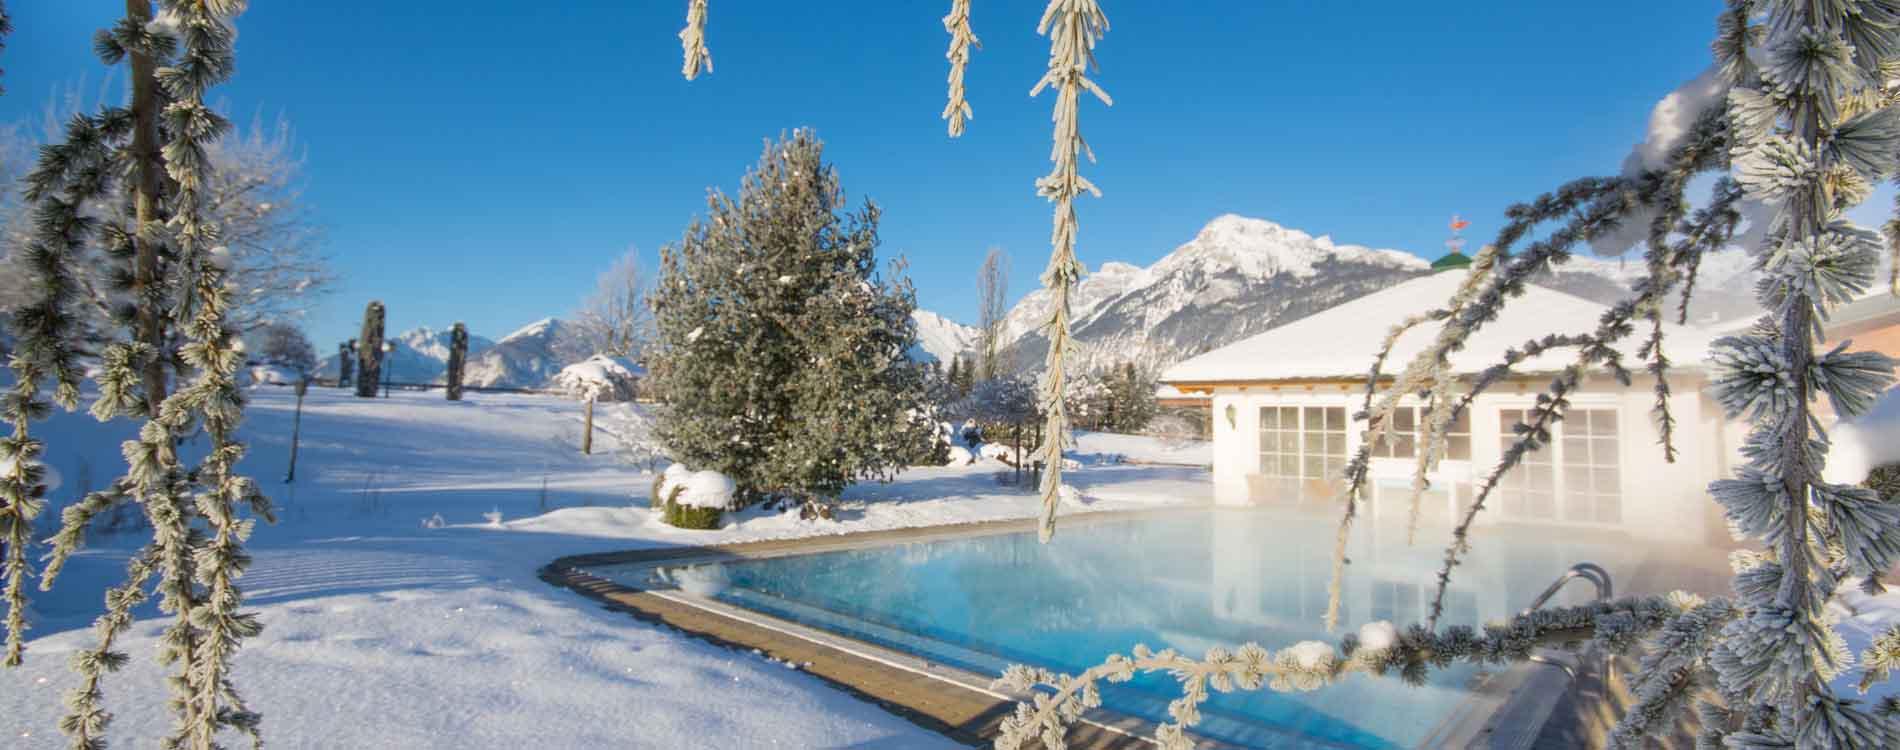 Pirchner Hof Reith Alpbach Valley Tyrol Holistic Hildegard von Bingen Naturopathy rejuvenation week Outsidepool Winterholidays